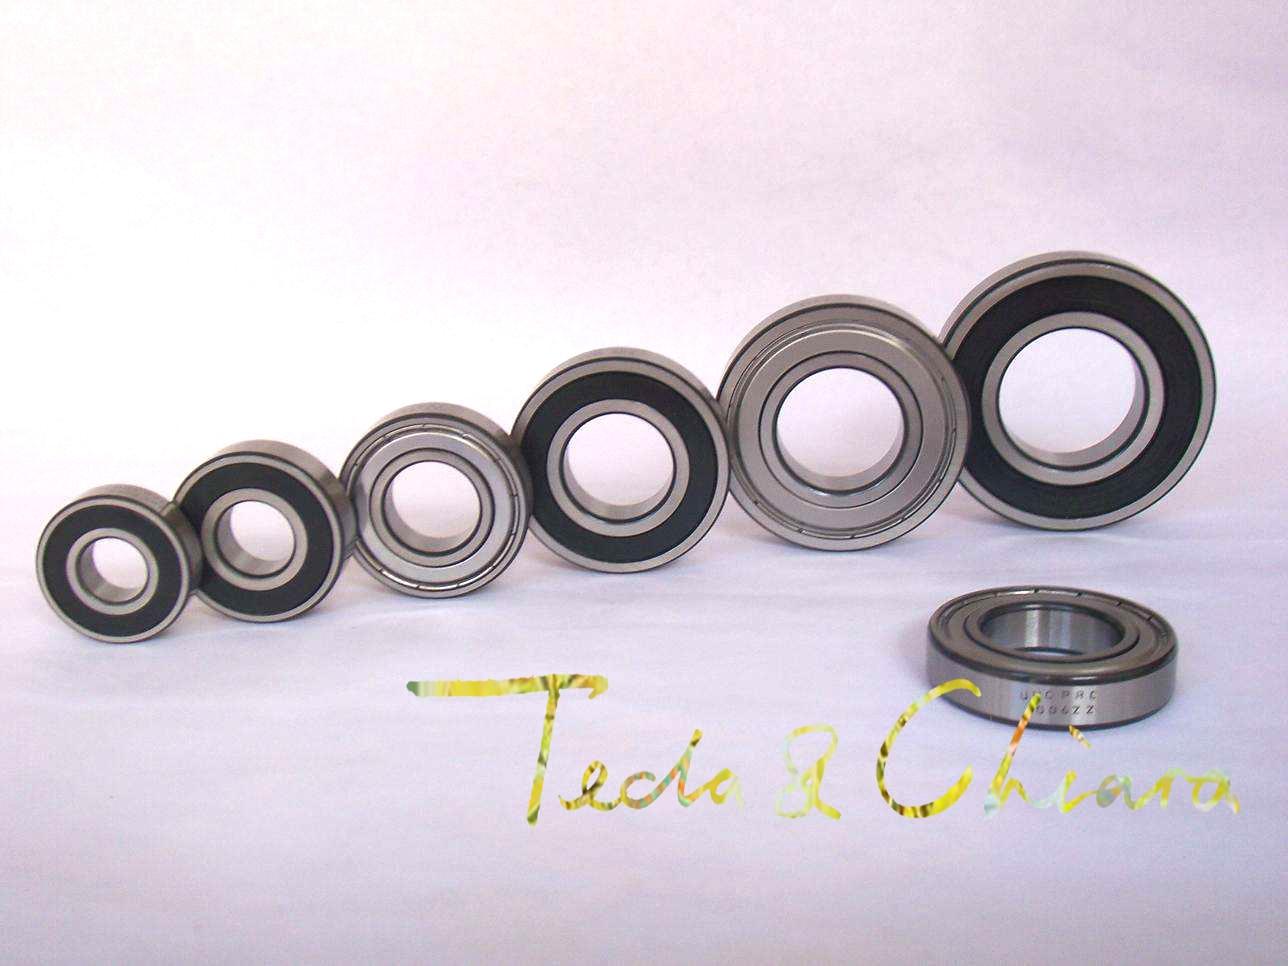 678RS 678ZZ MR128 MR128ZZ MR128RS MR128-2Z MR128-2RS 678 ZZ RS RZ 2RZ Deep Groove Ball Bearings 8 X 12 X 3.5mm High Quality